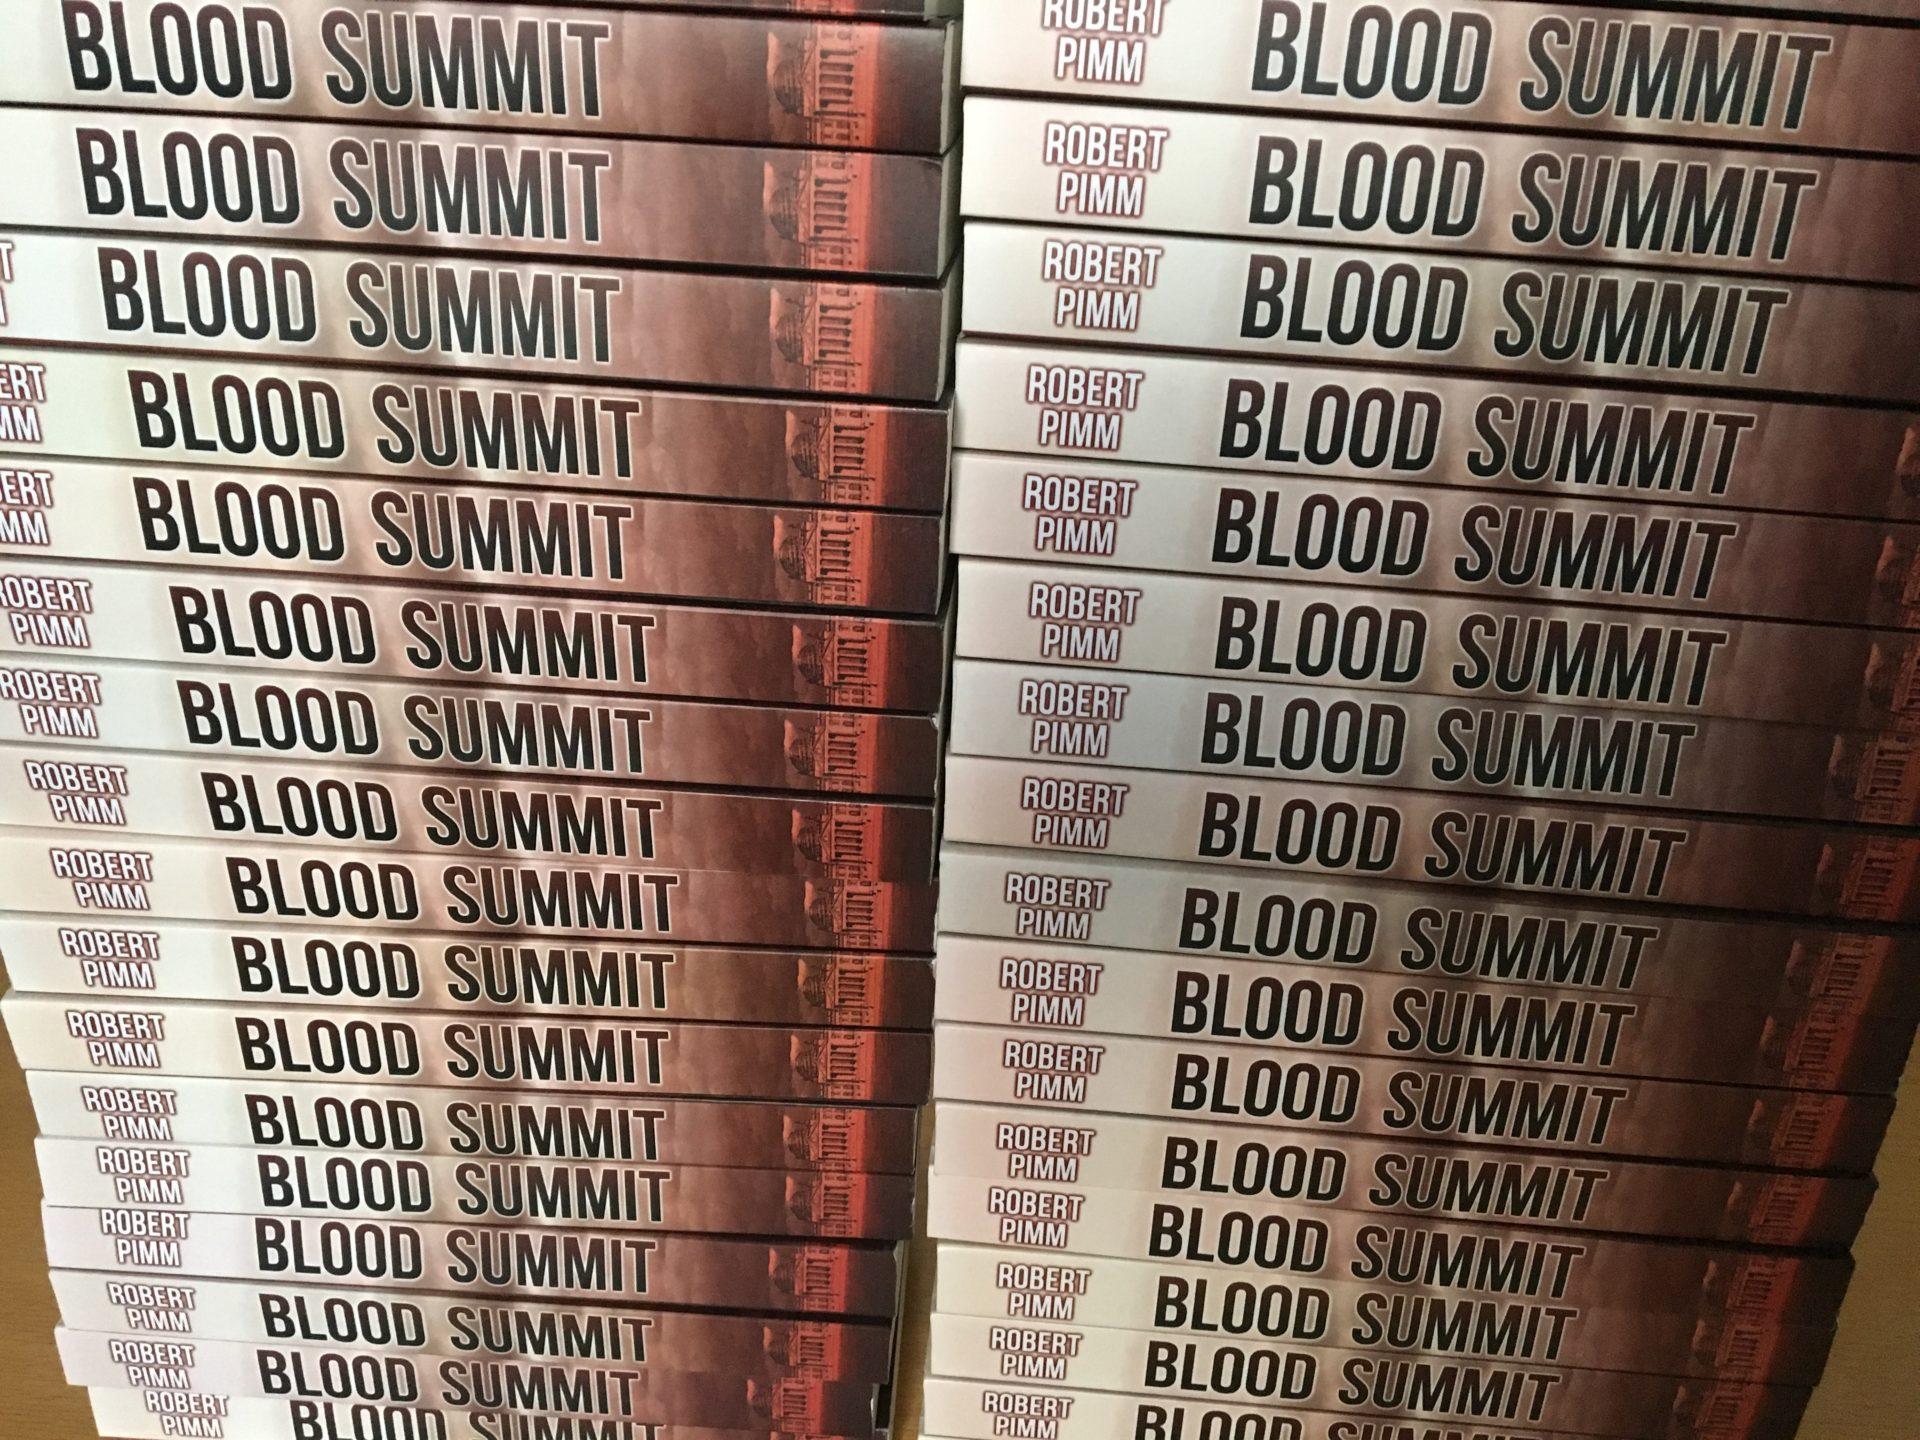 Blood Summit